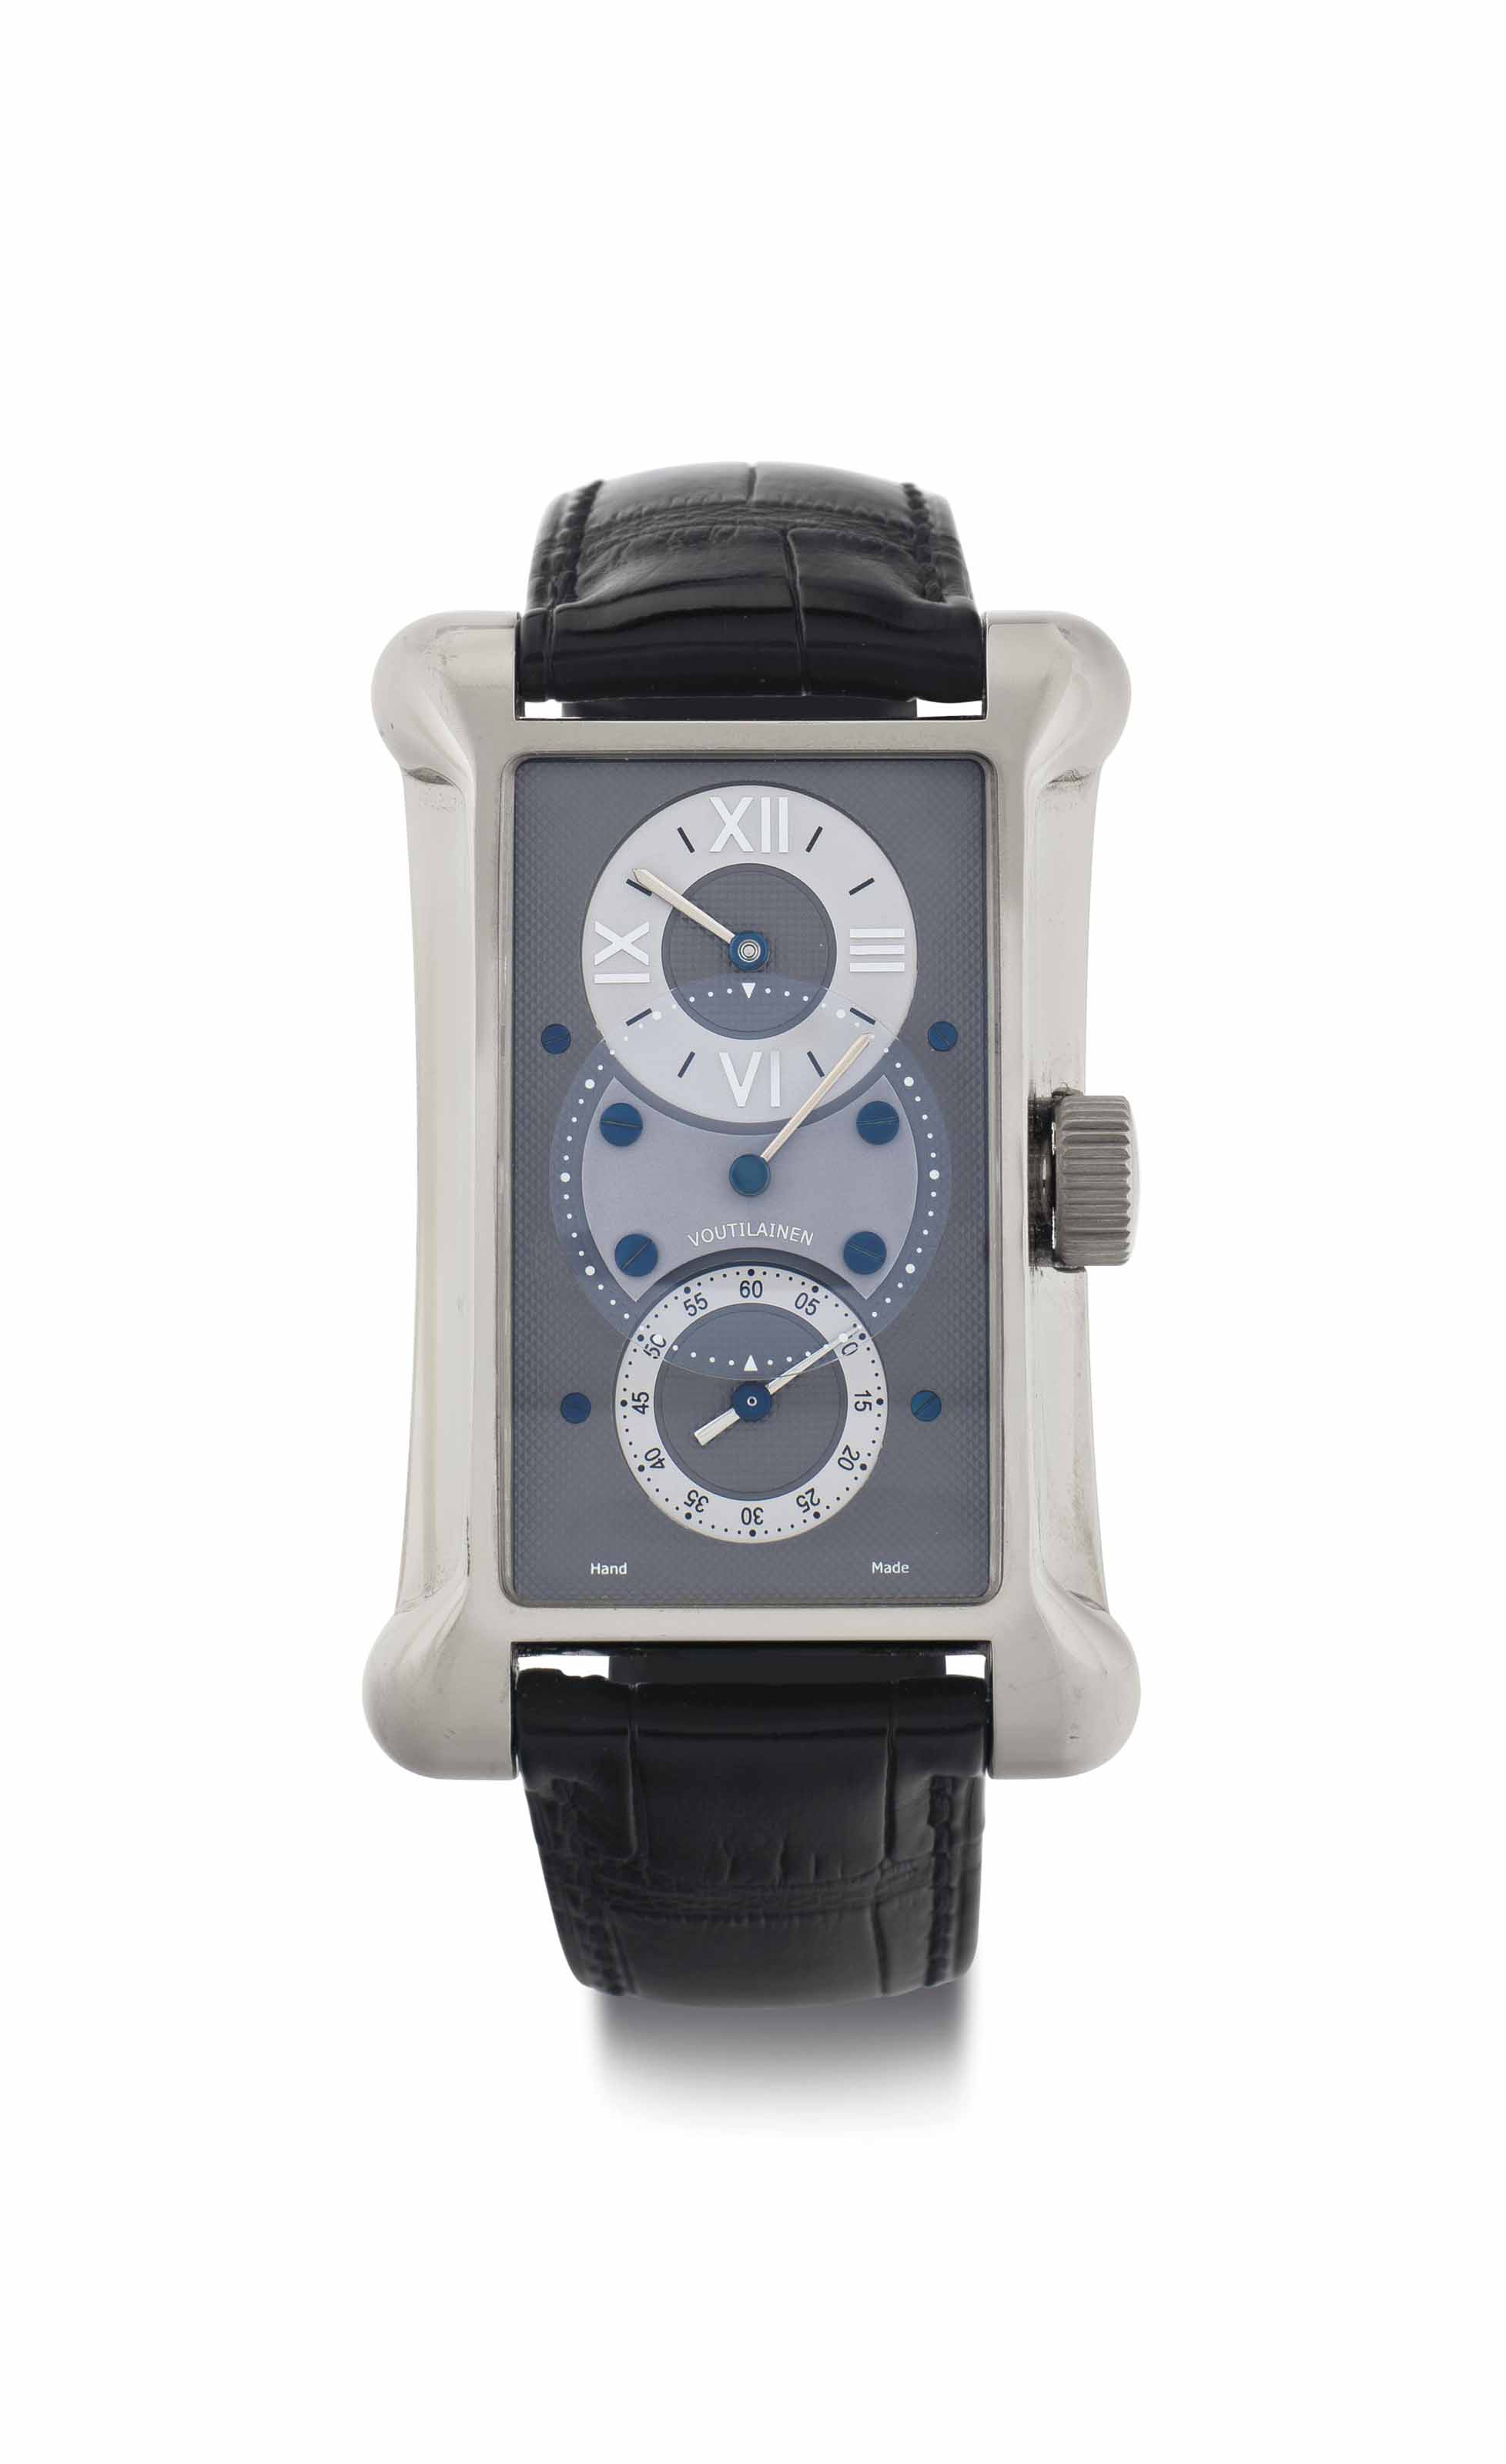 Kari Voutilainen. A Very Fine 18k White Gold Wristwatch with Regulator Dial